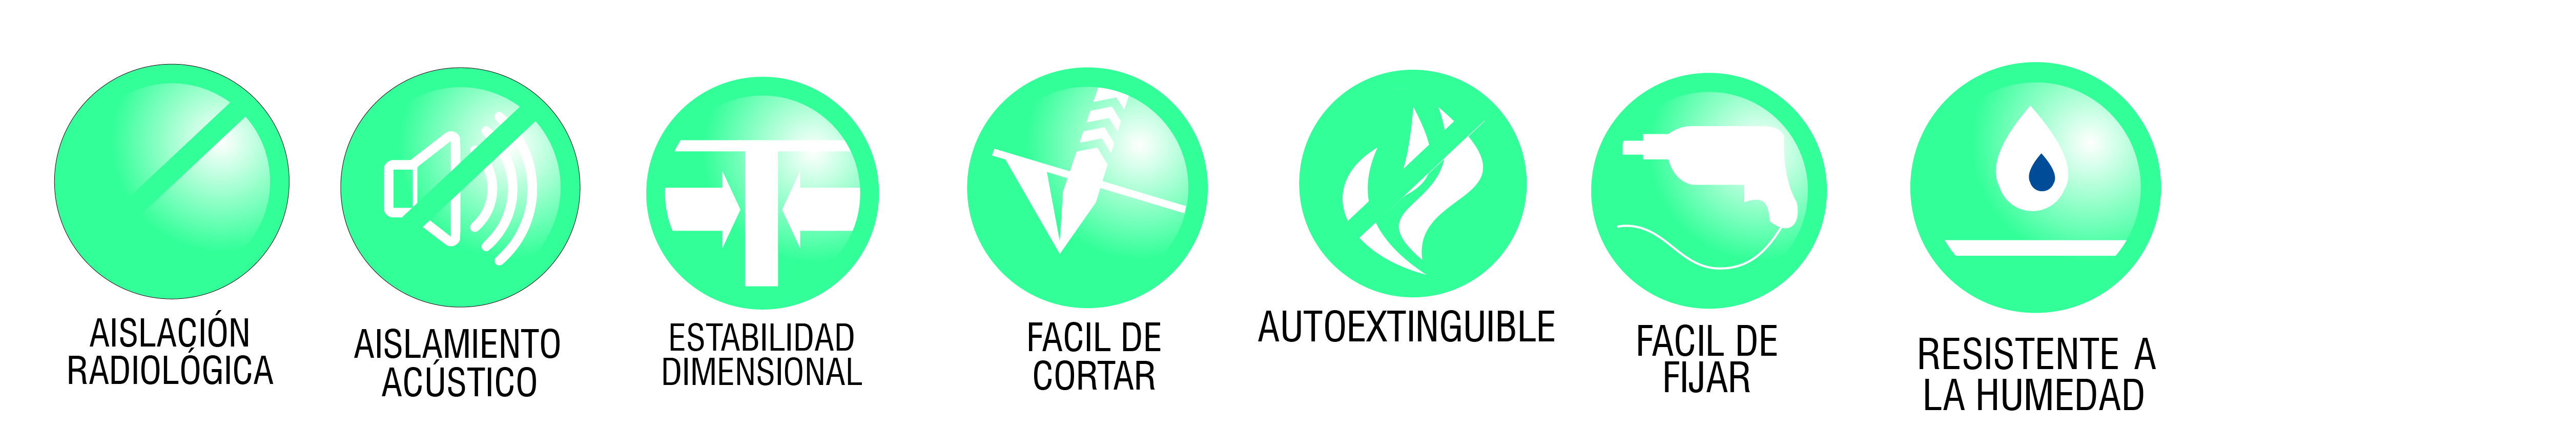 icono radiologico